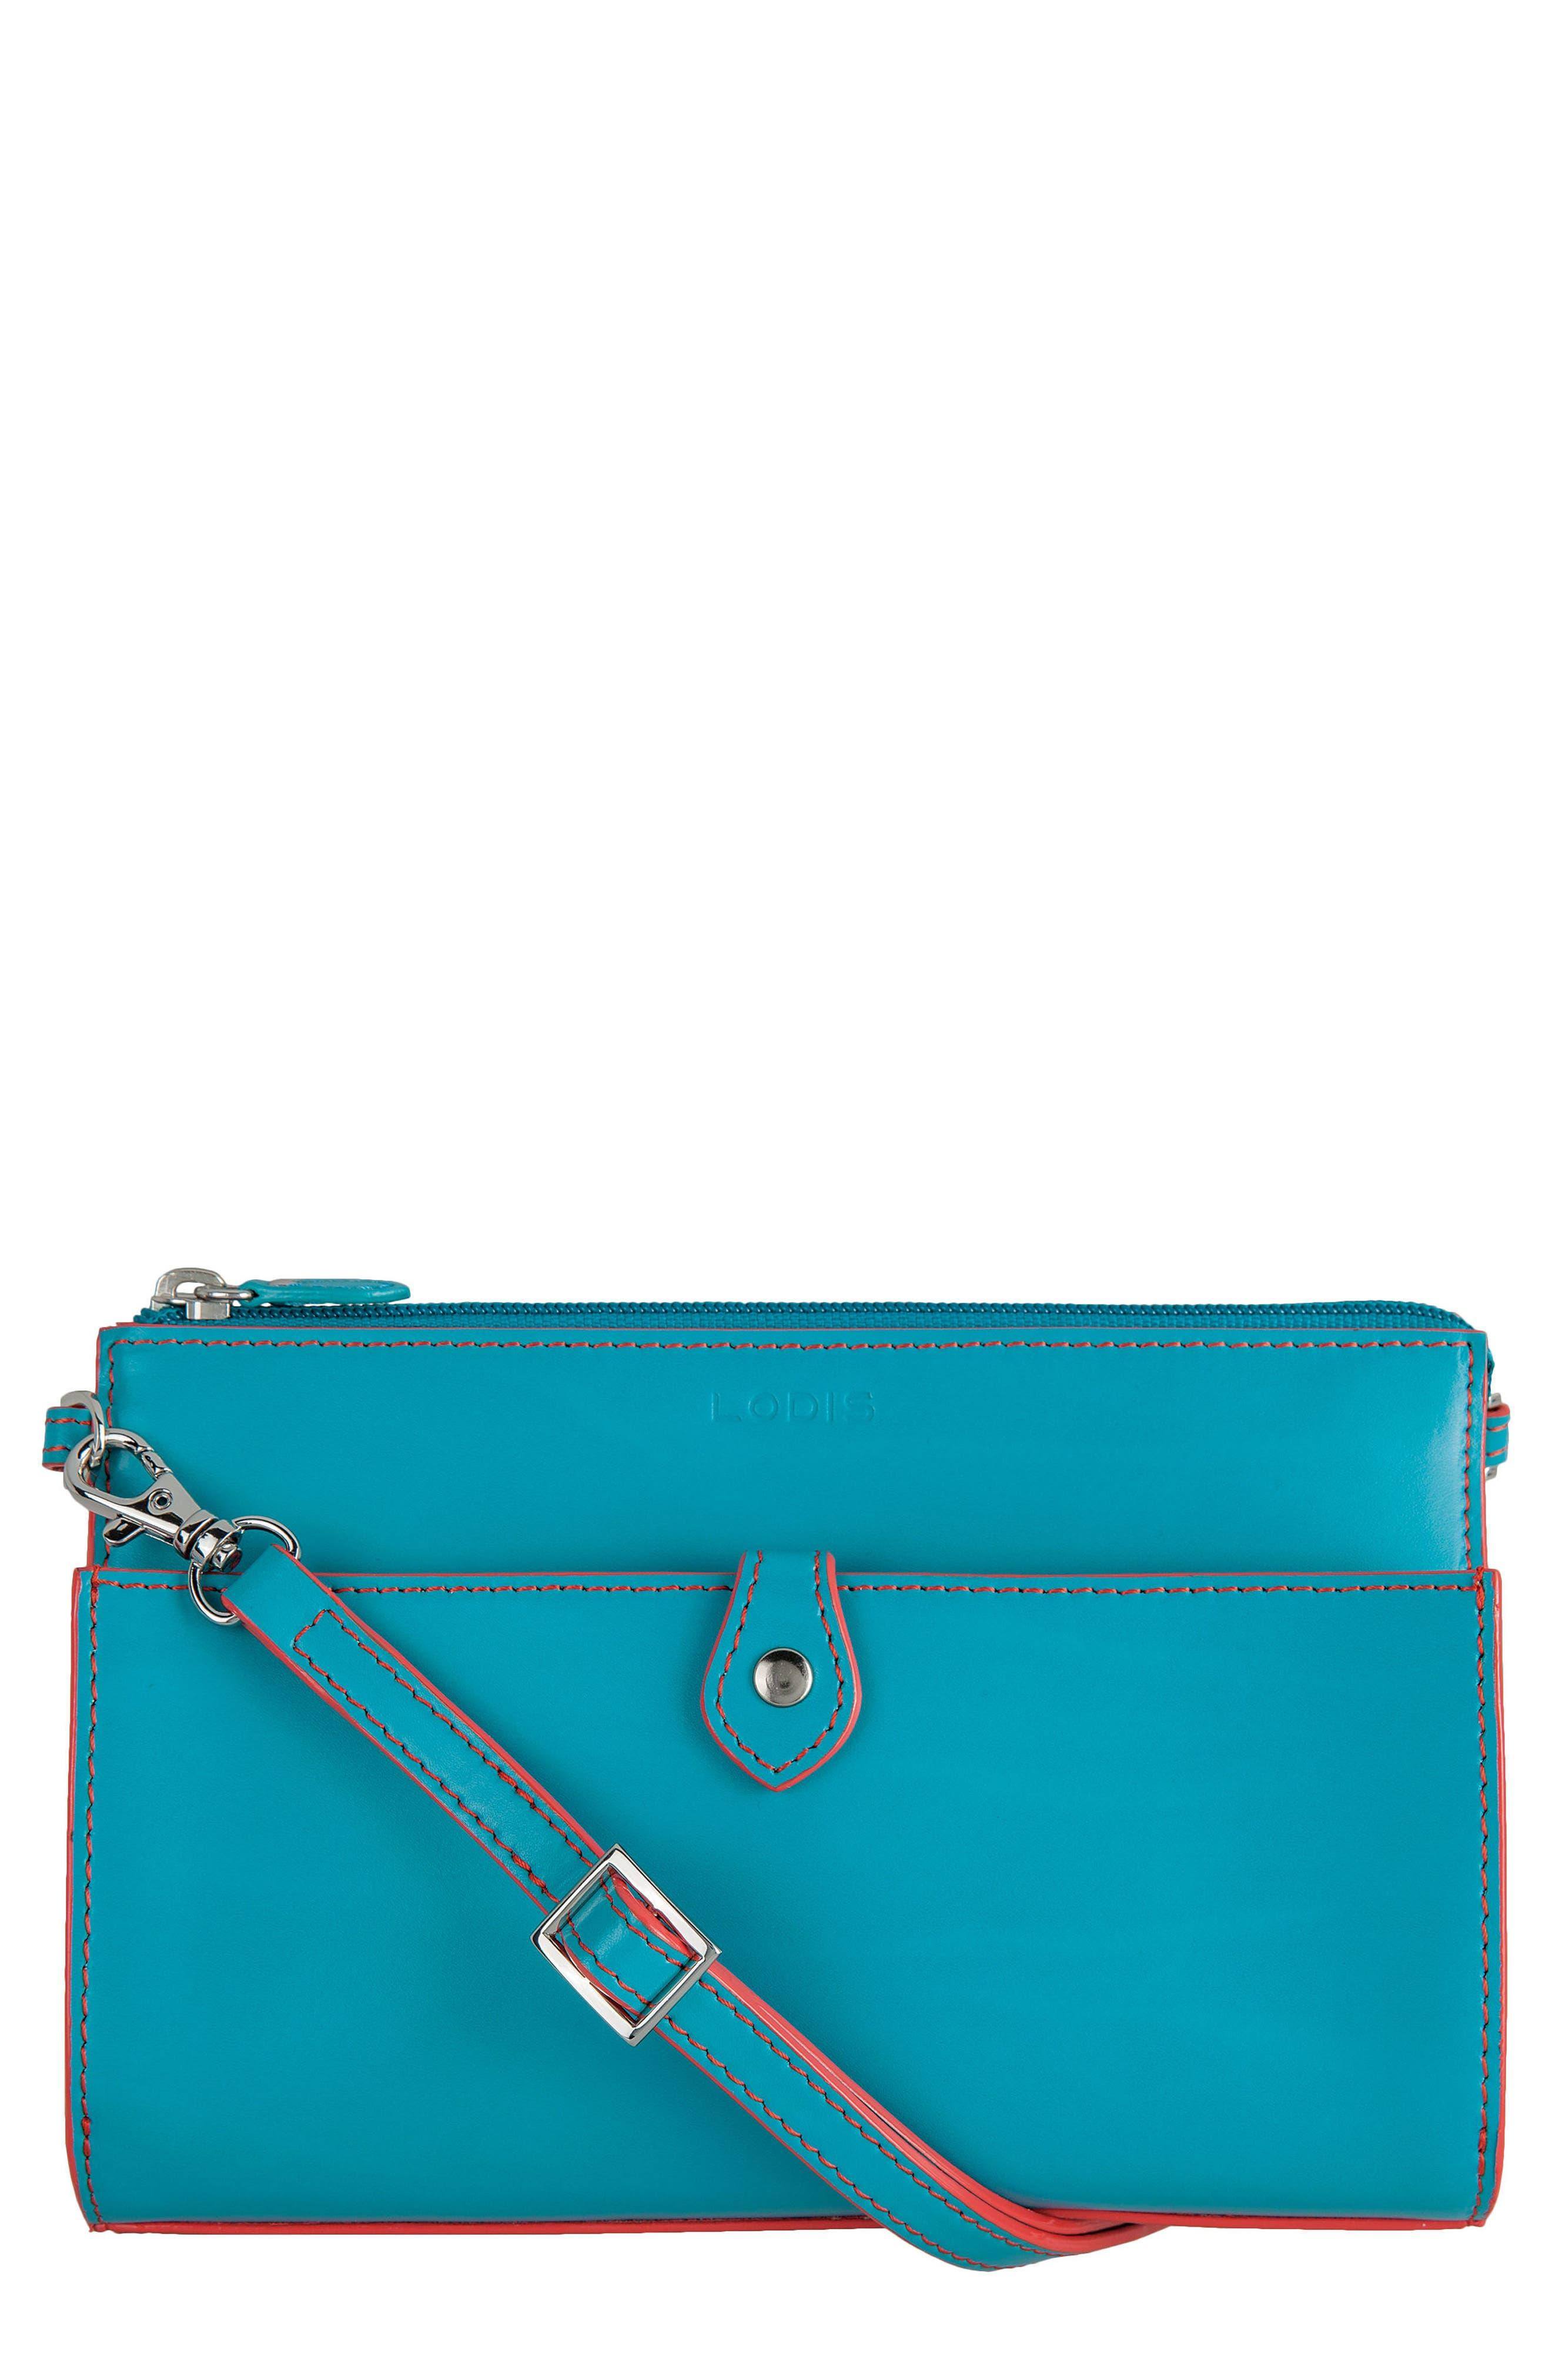 LODIS 'Audrey Collection -Vicky' ConvertibleCrossbody Bag